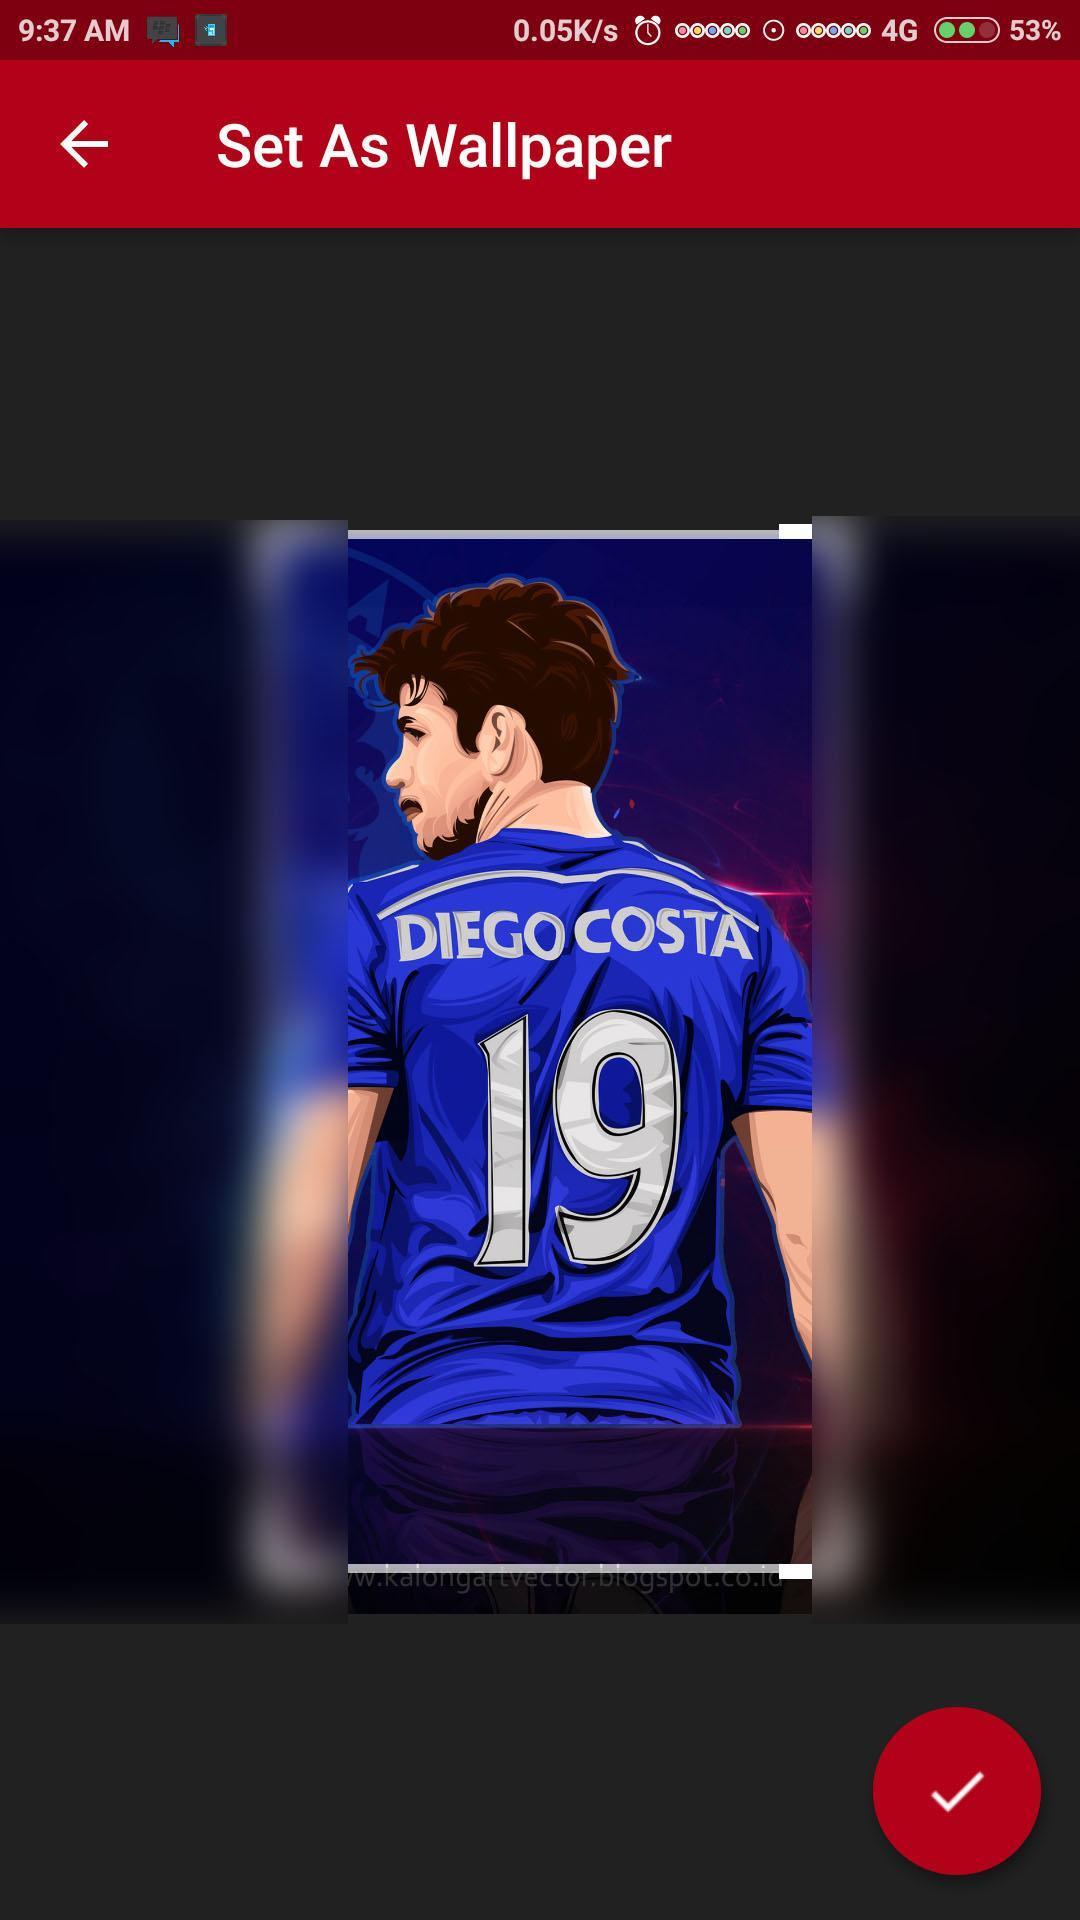 Diego Costa Wallpaper HD poster